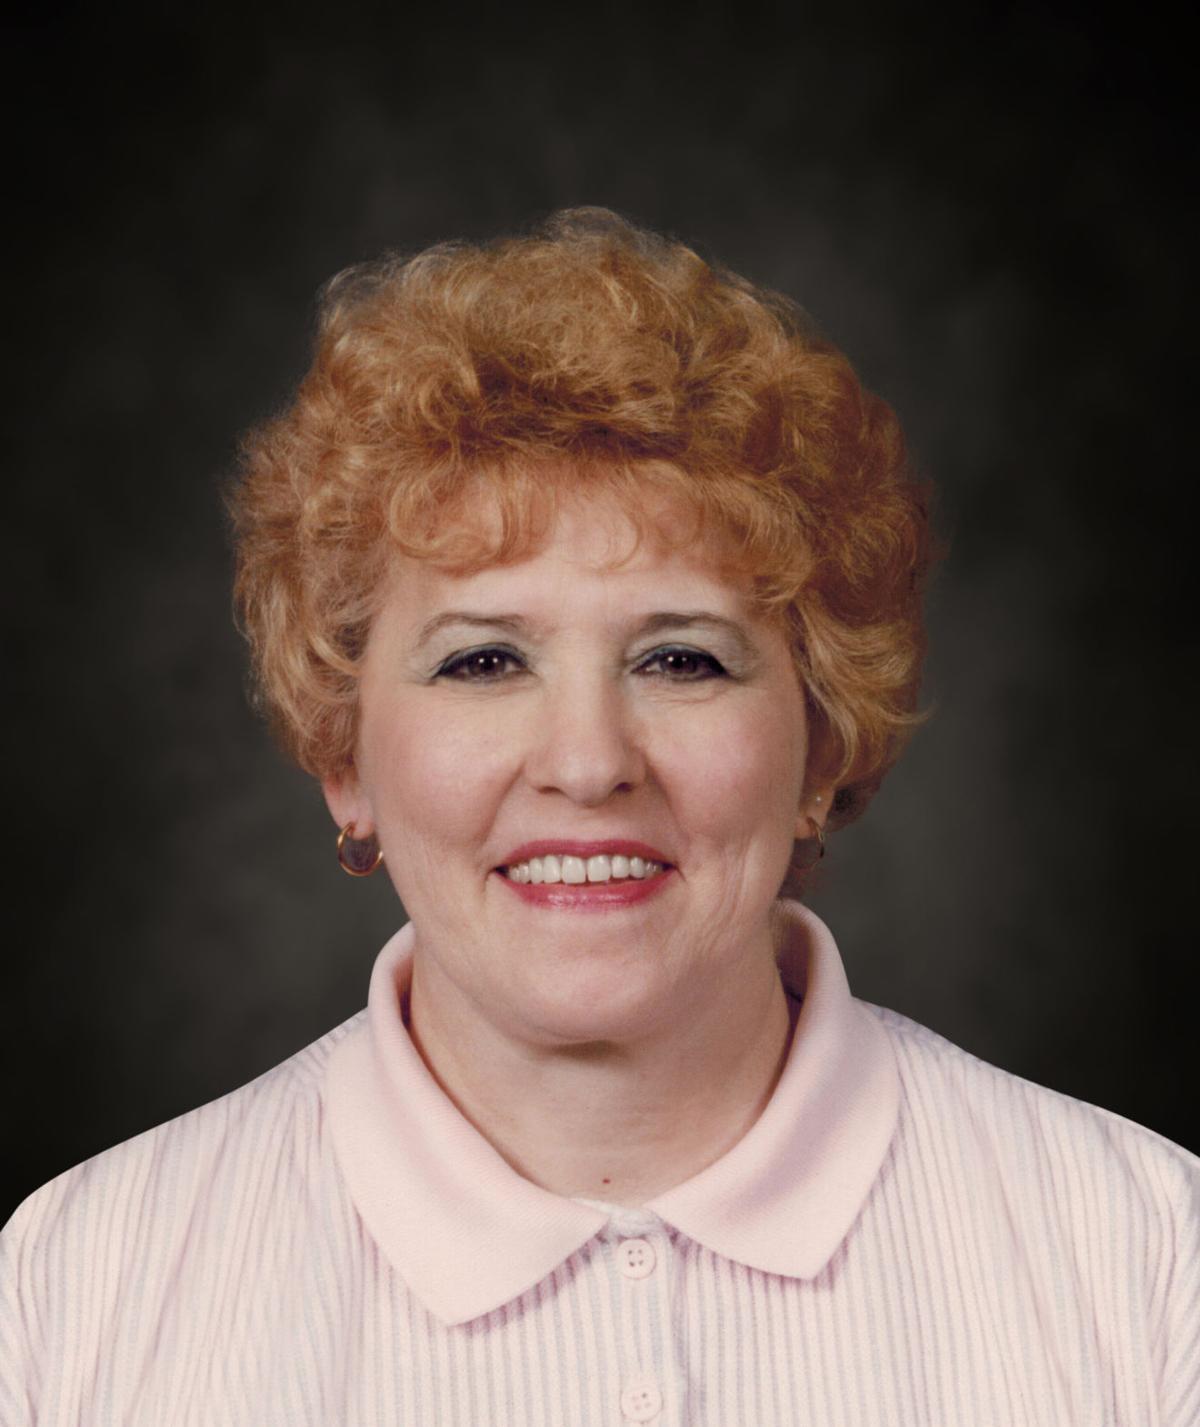 Happy 90th birthday to Theresa Sulski